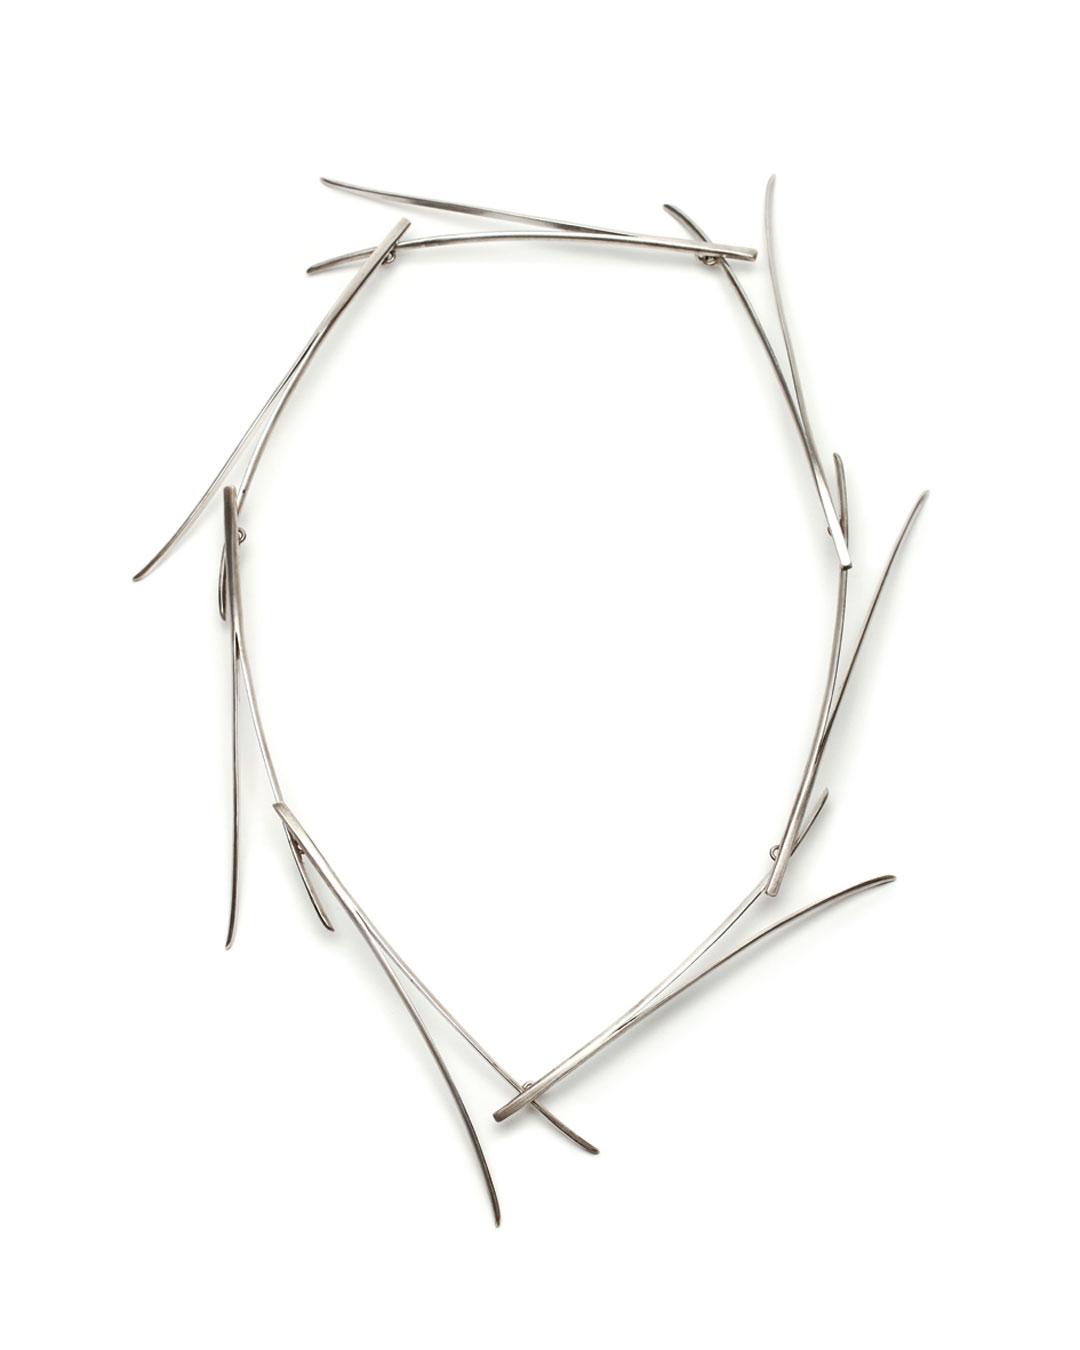 Silke Trekel, Föhren (Pines), 2016, necklace; silver, 320 x 235 x 20 mm, €3880